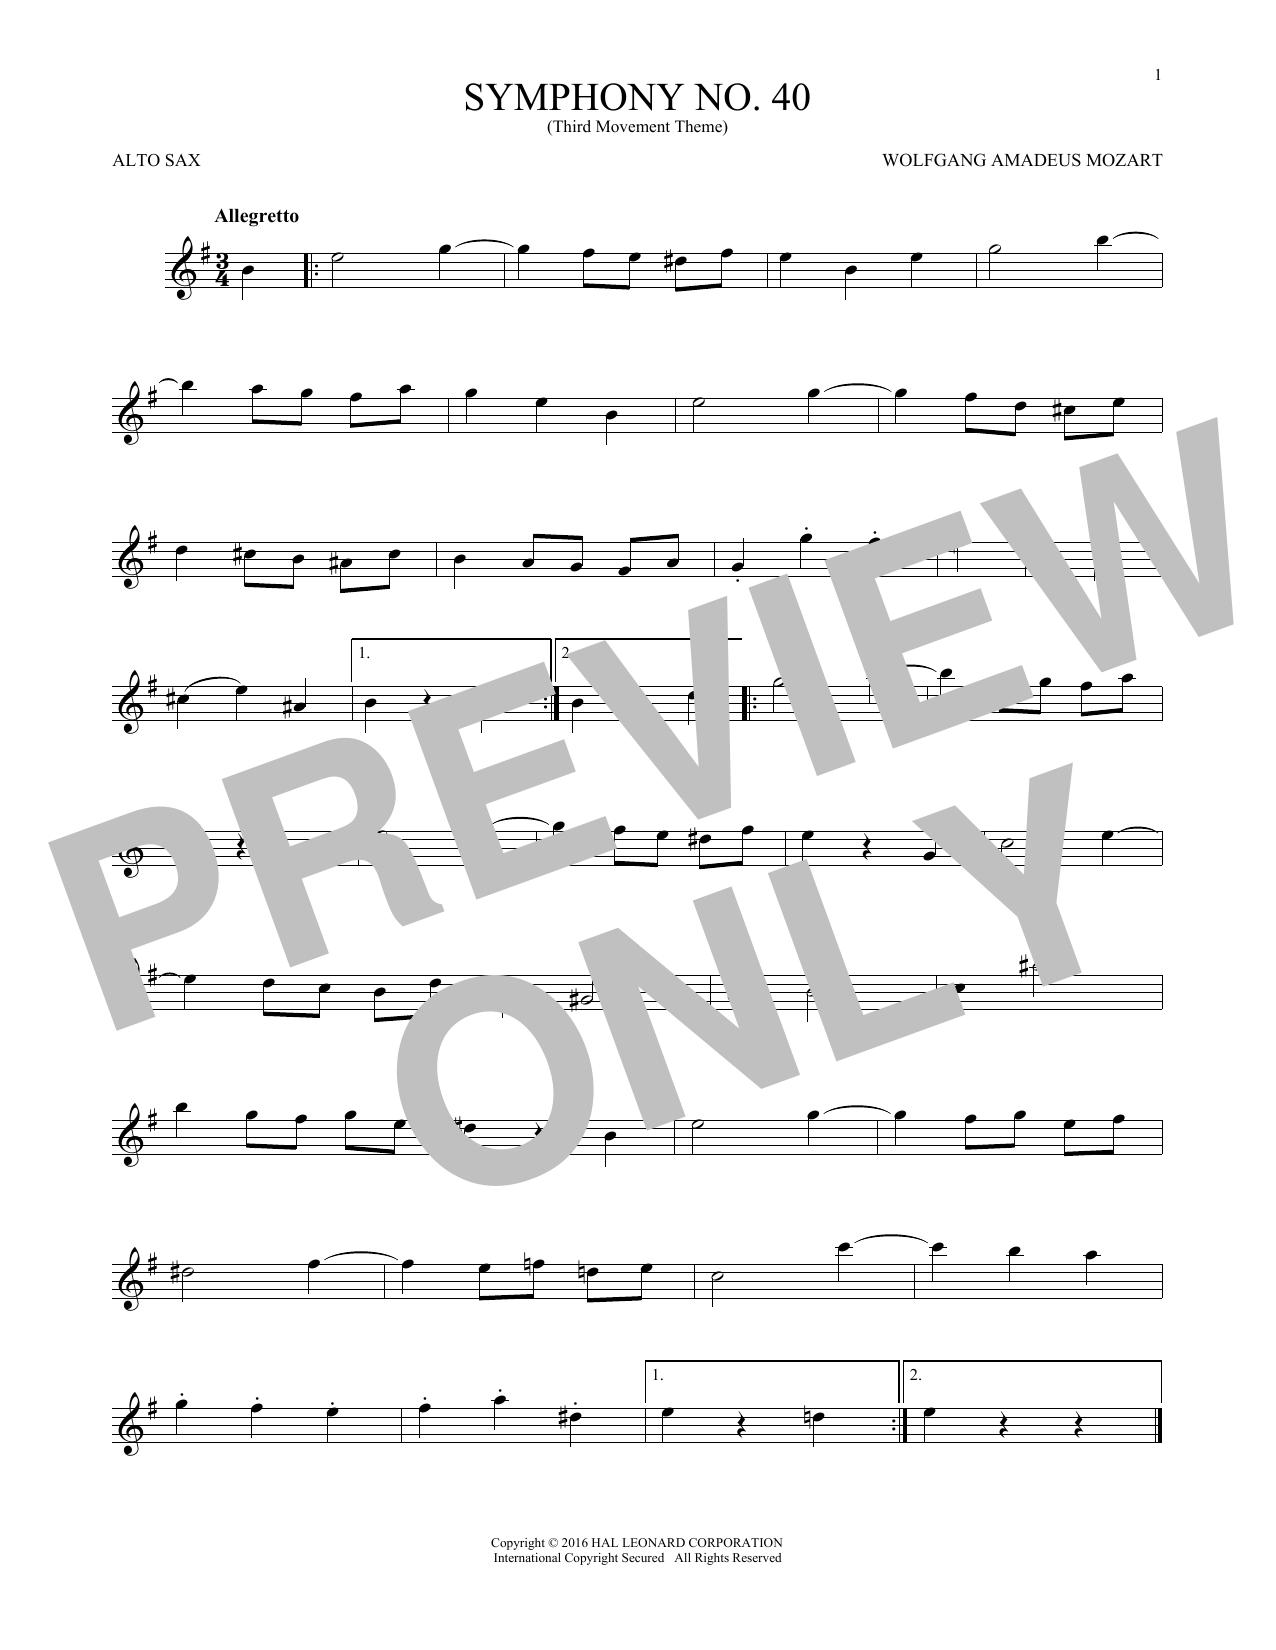 Wolfgang Amadeus Mozart Symphony No. 40 In G Minor, Third Movement (